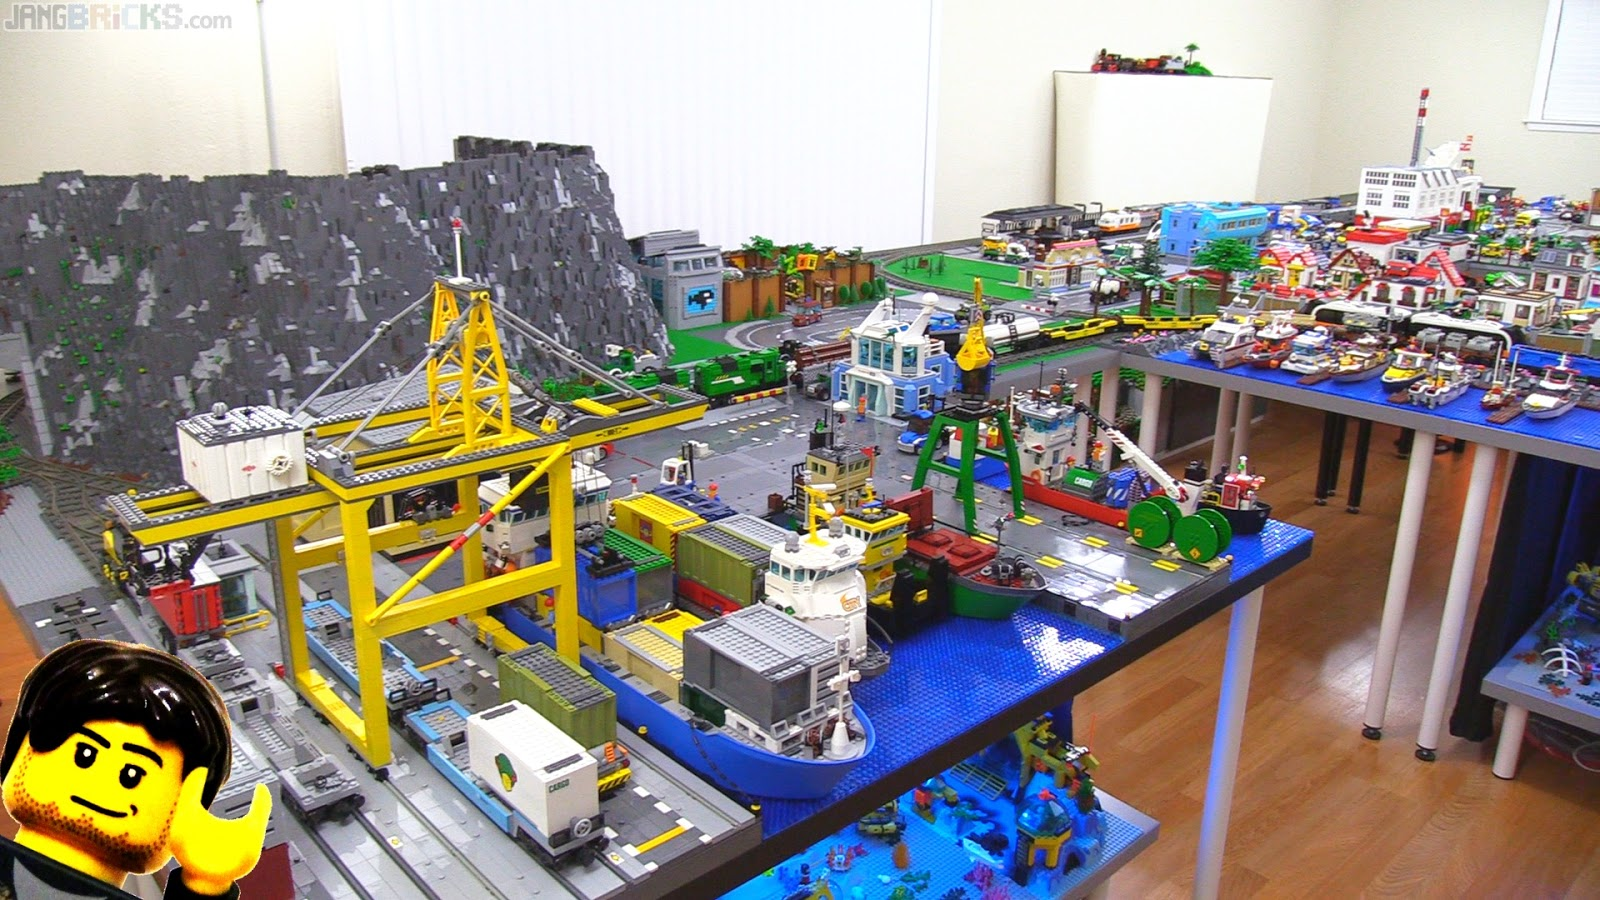 A Current Look At New Jang City